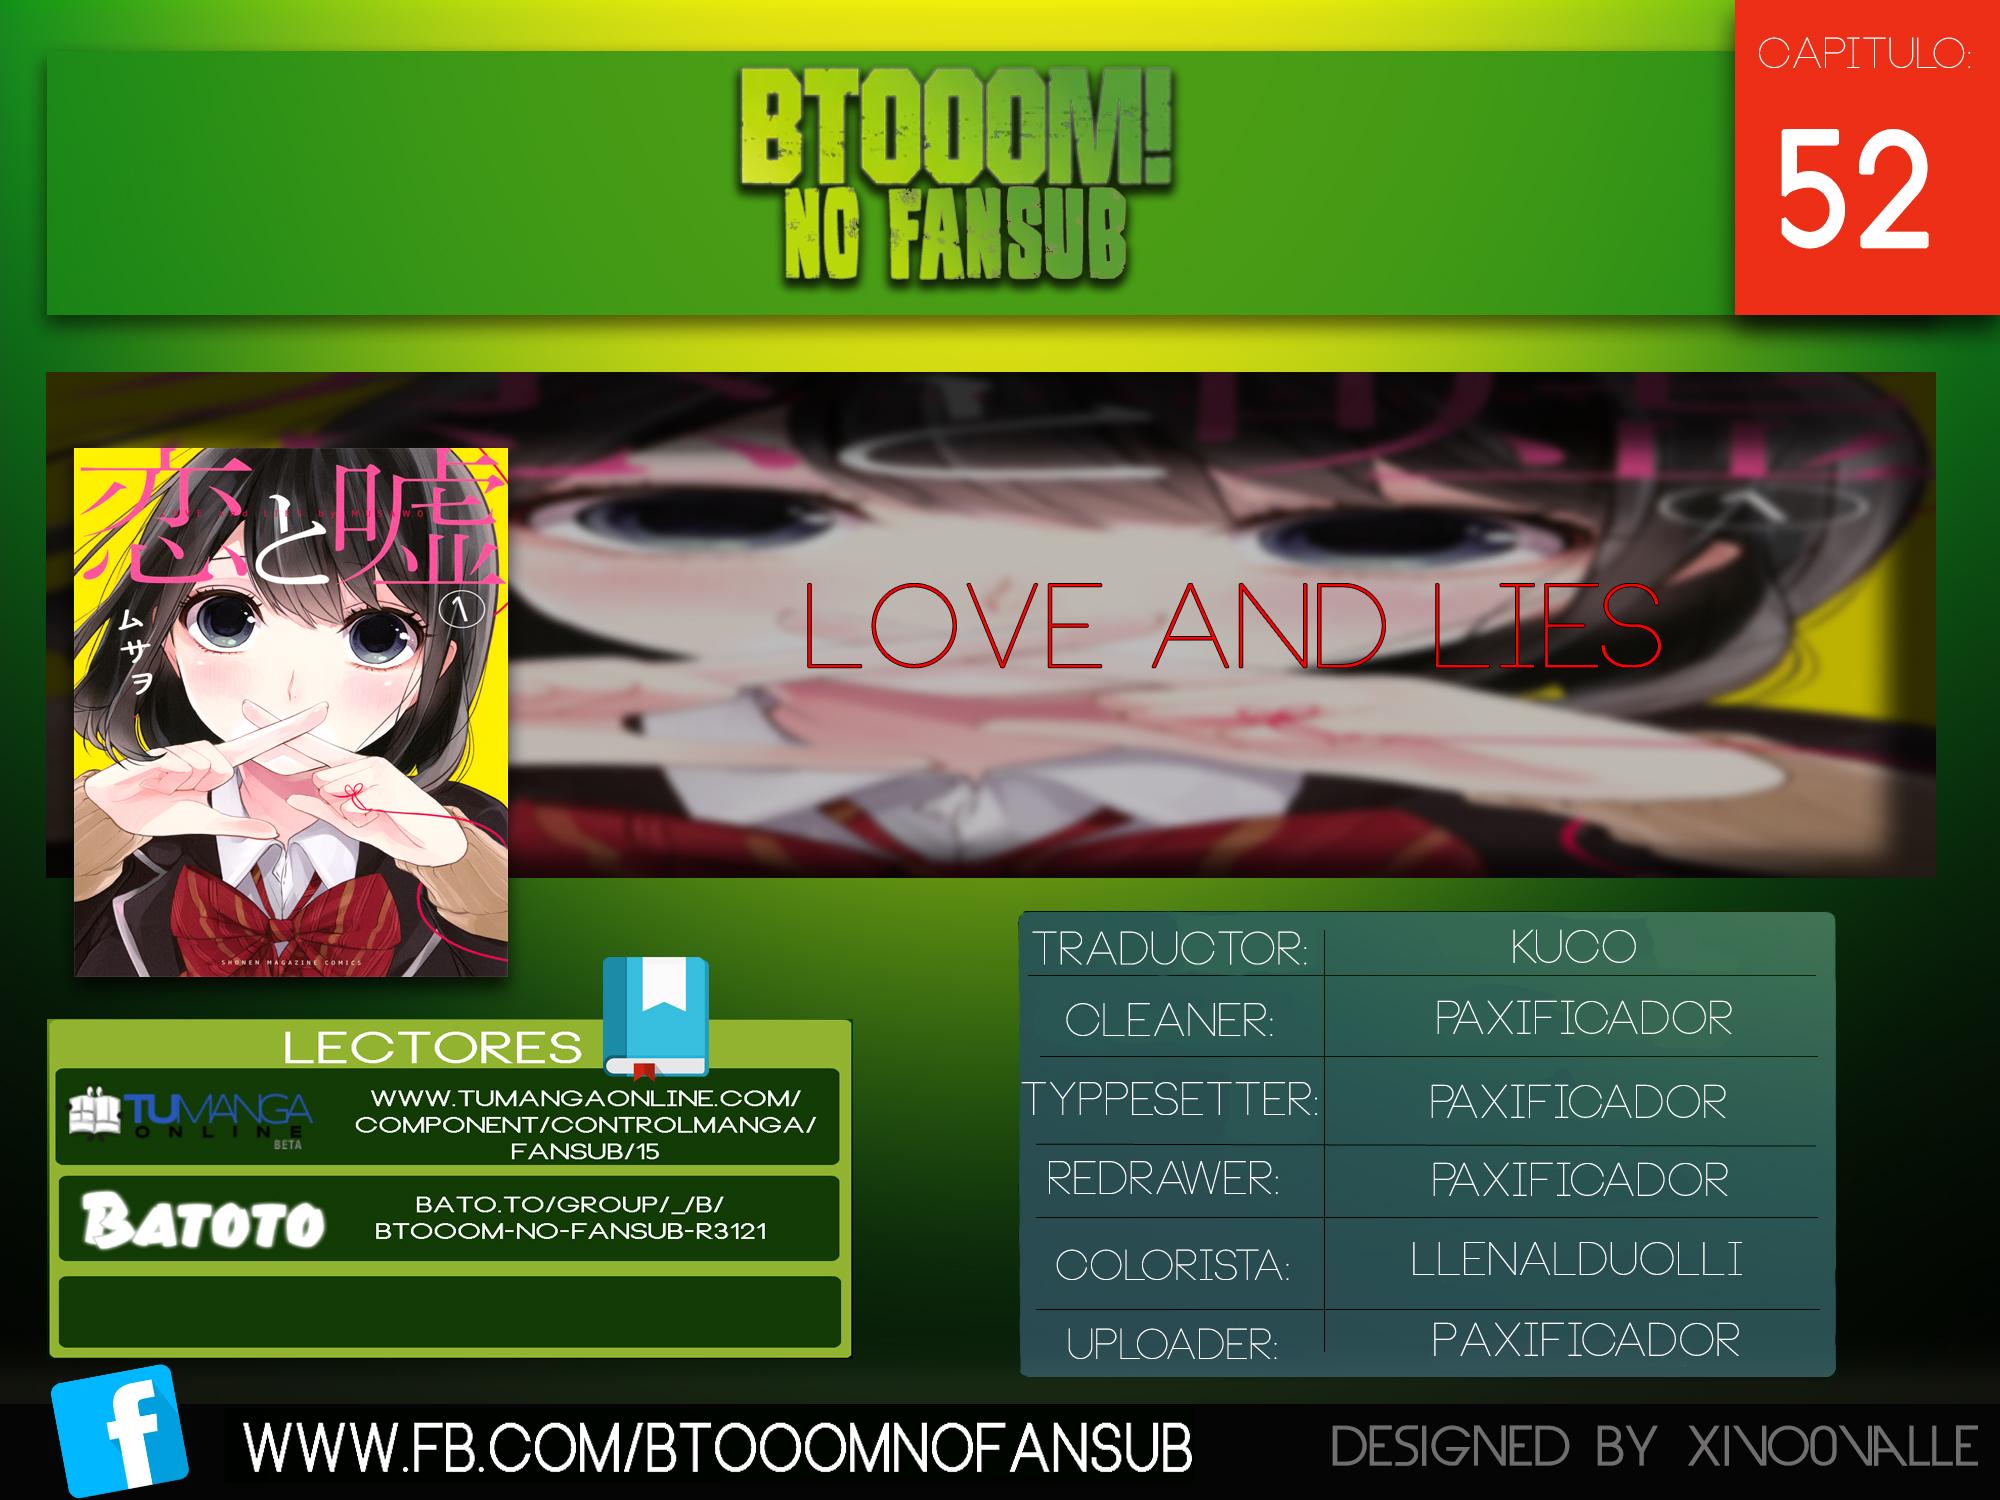 http://c5.ninemanga.com/es_manga/14/14734/416027/3b2570d084283629e1d02cc8a37bceb7.jpg Page 1